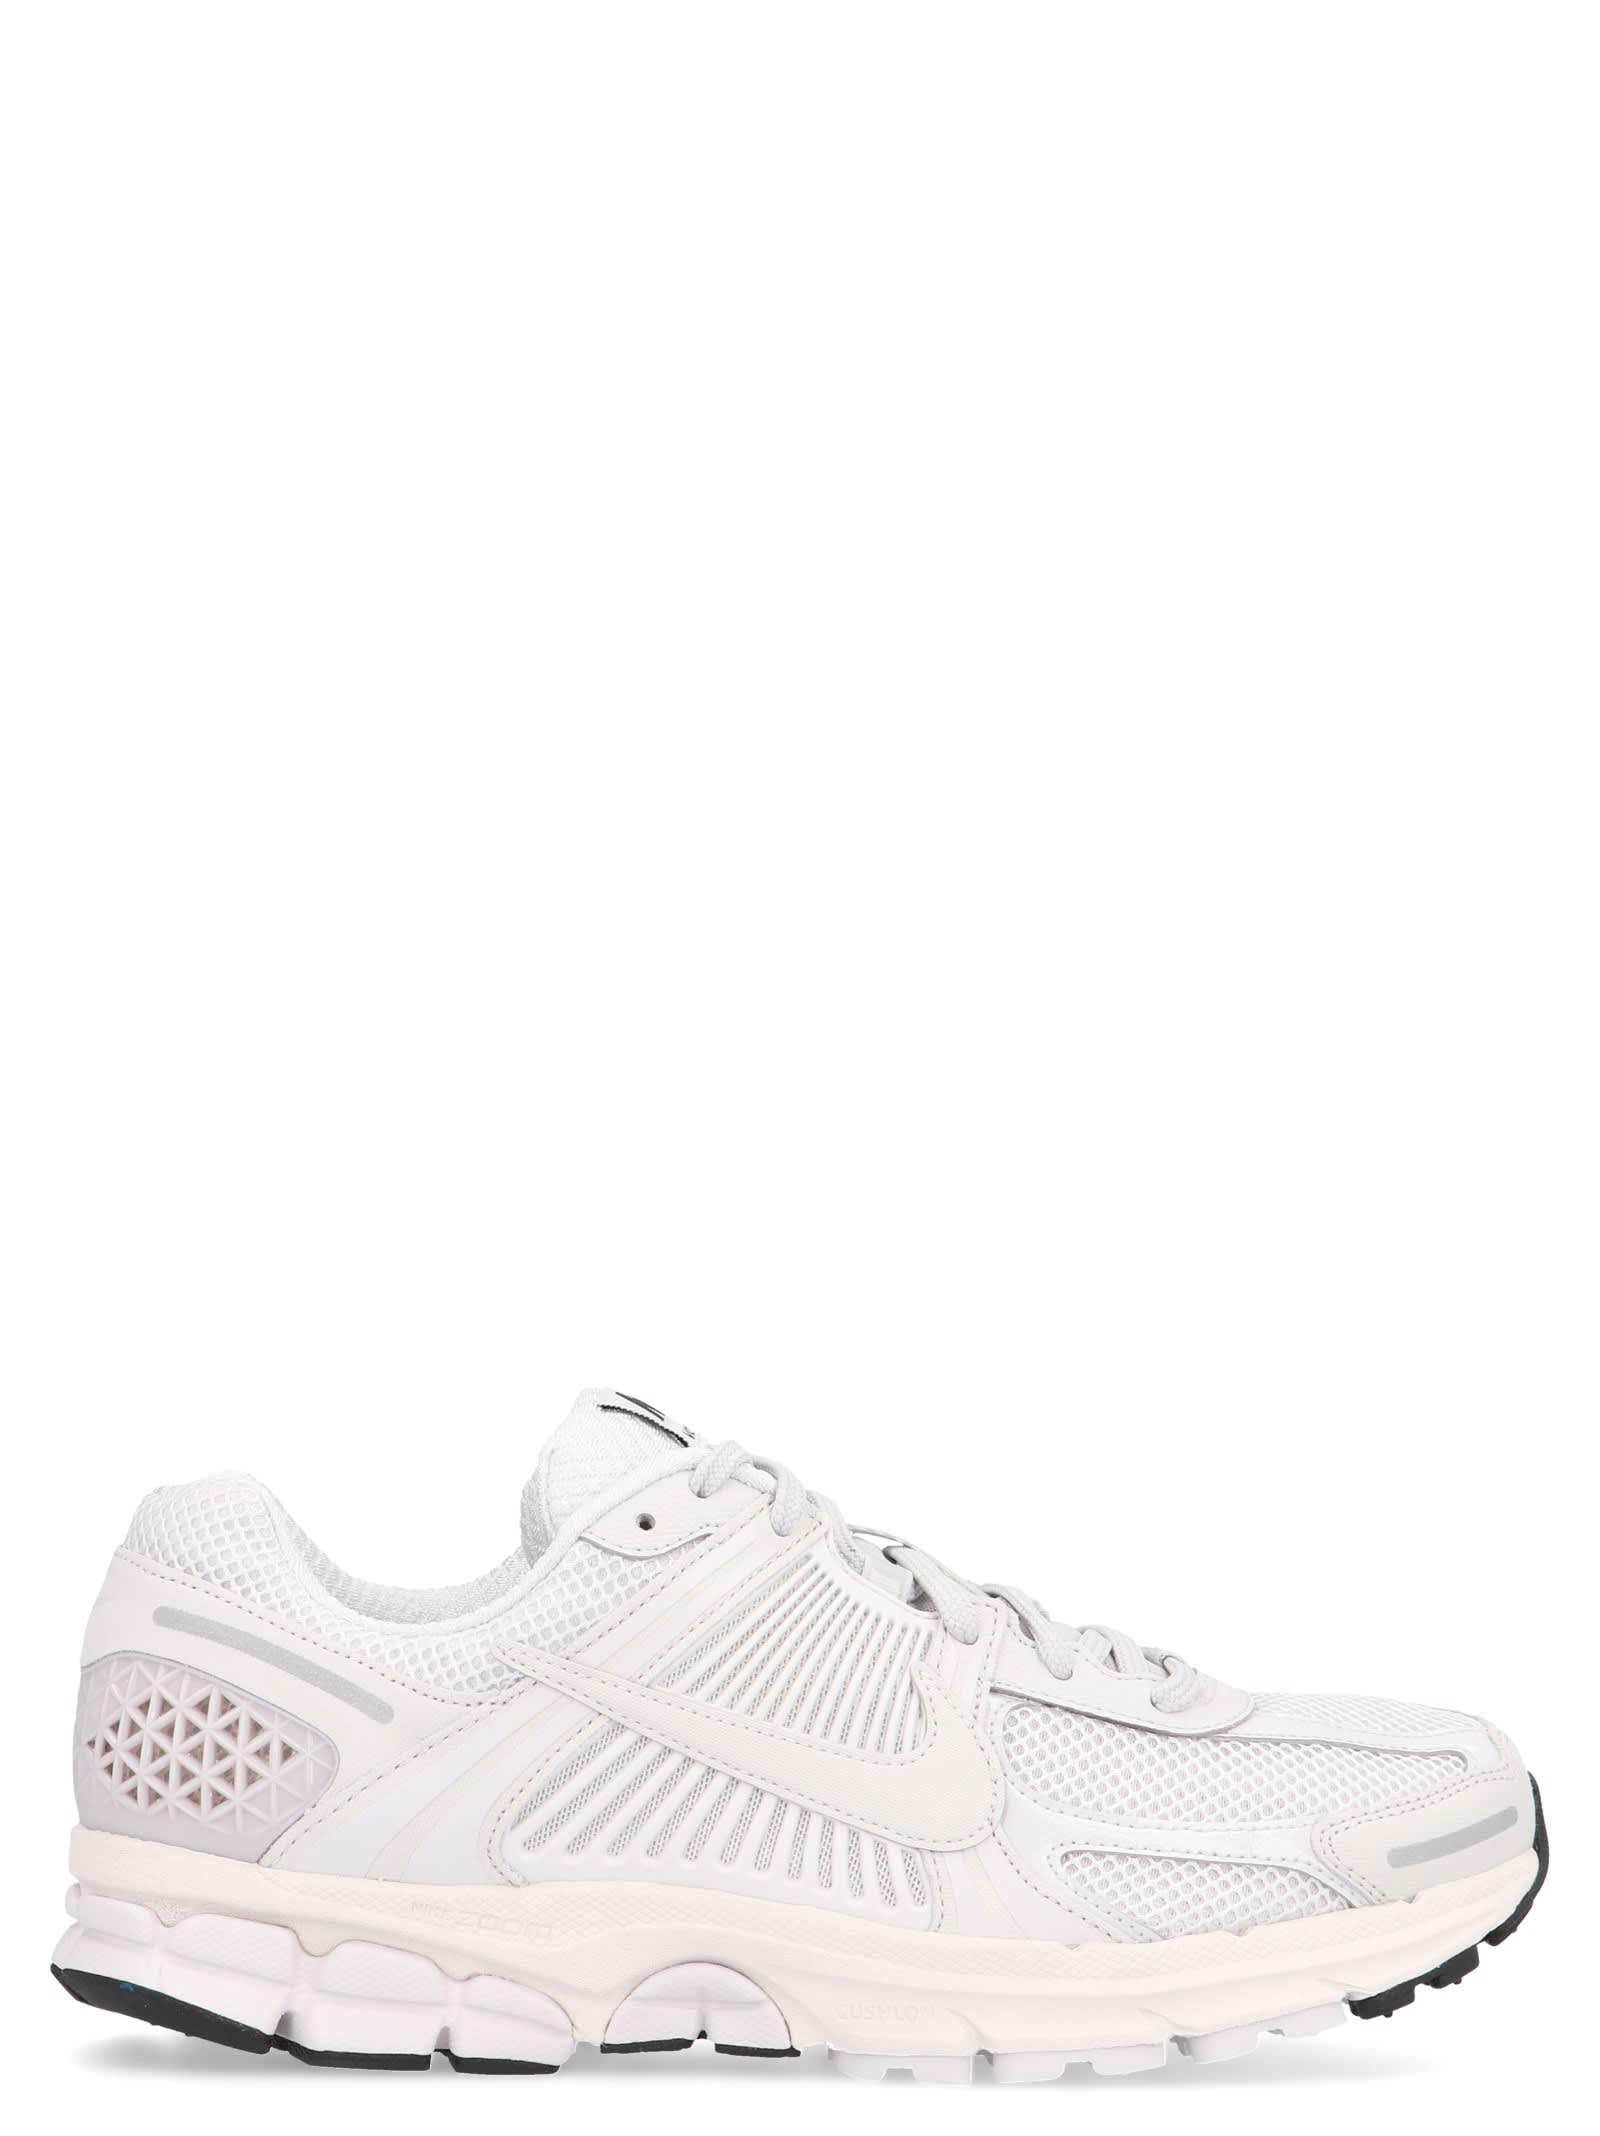 buy online ff674 4ec8c Nike 'zoom Vomero 5 Sp' Shoes